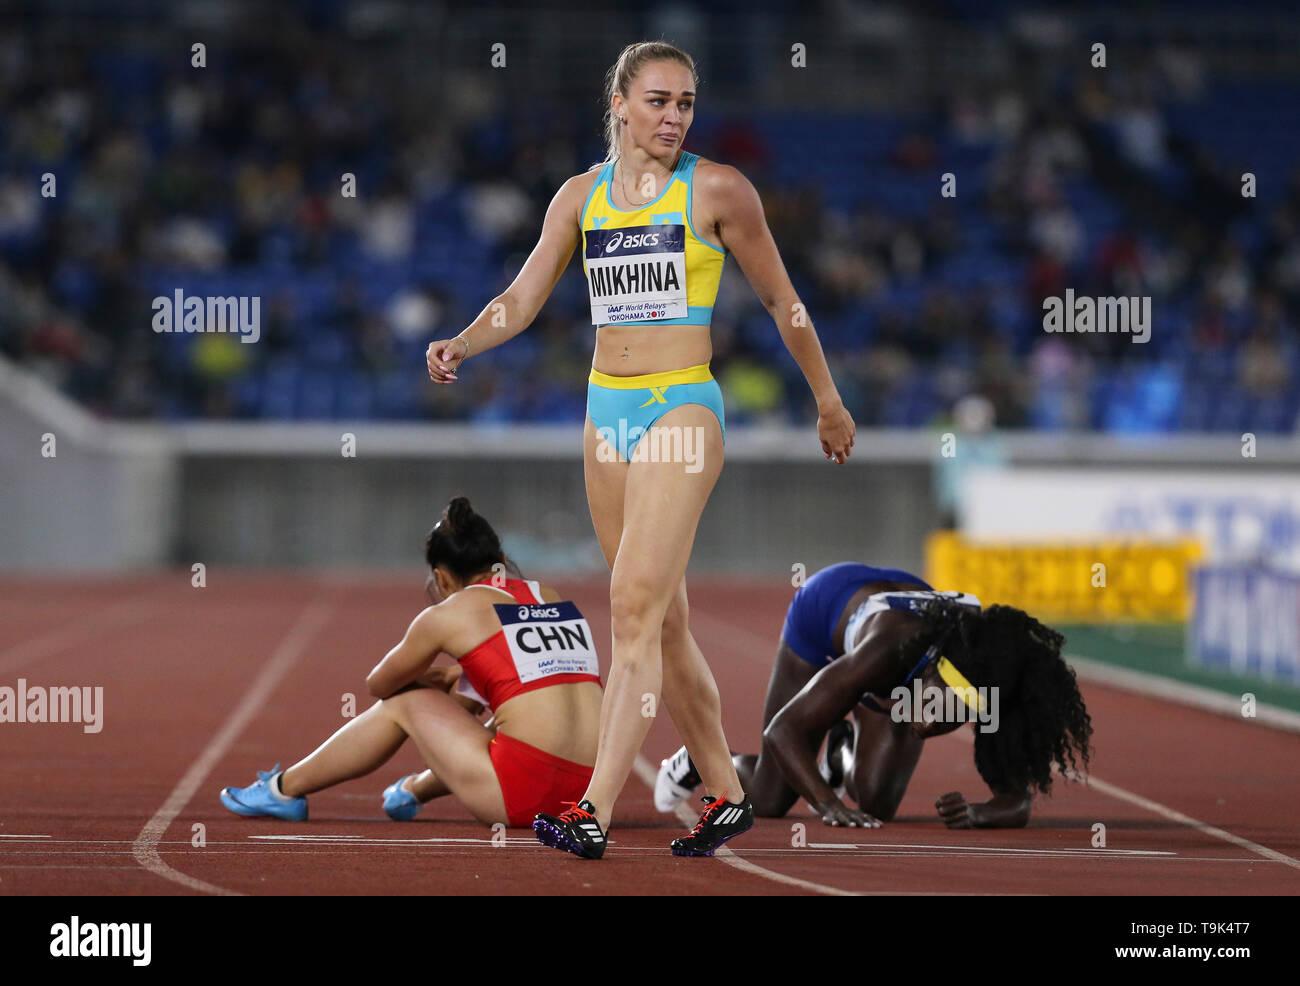 YOKOHAMA, JAPAN - MAY 10: Elina Mikhina of Kazakhstan after the mixed 4x400m relay during Day 1 of the 2019 IAAF World Relay Championships at the Nissan Stadium on Saturday May 11, 2019 in Yokohama, Japan. (Photo by Roger Sedres for the IAAF) - Stock Image